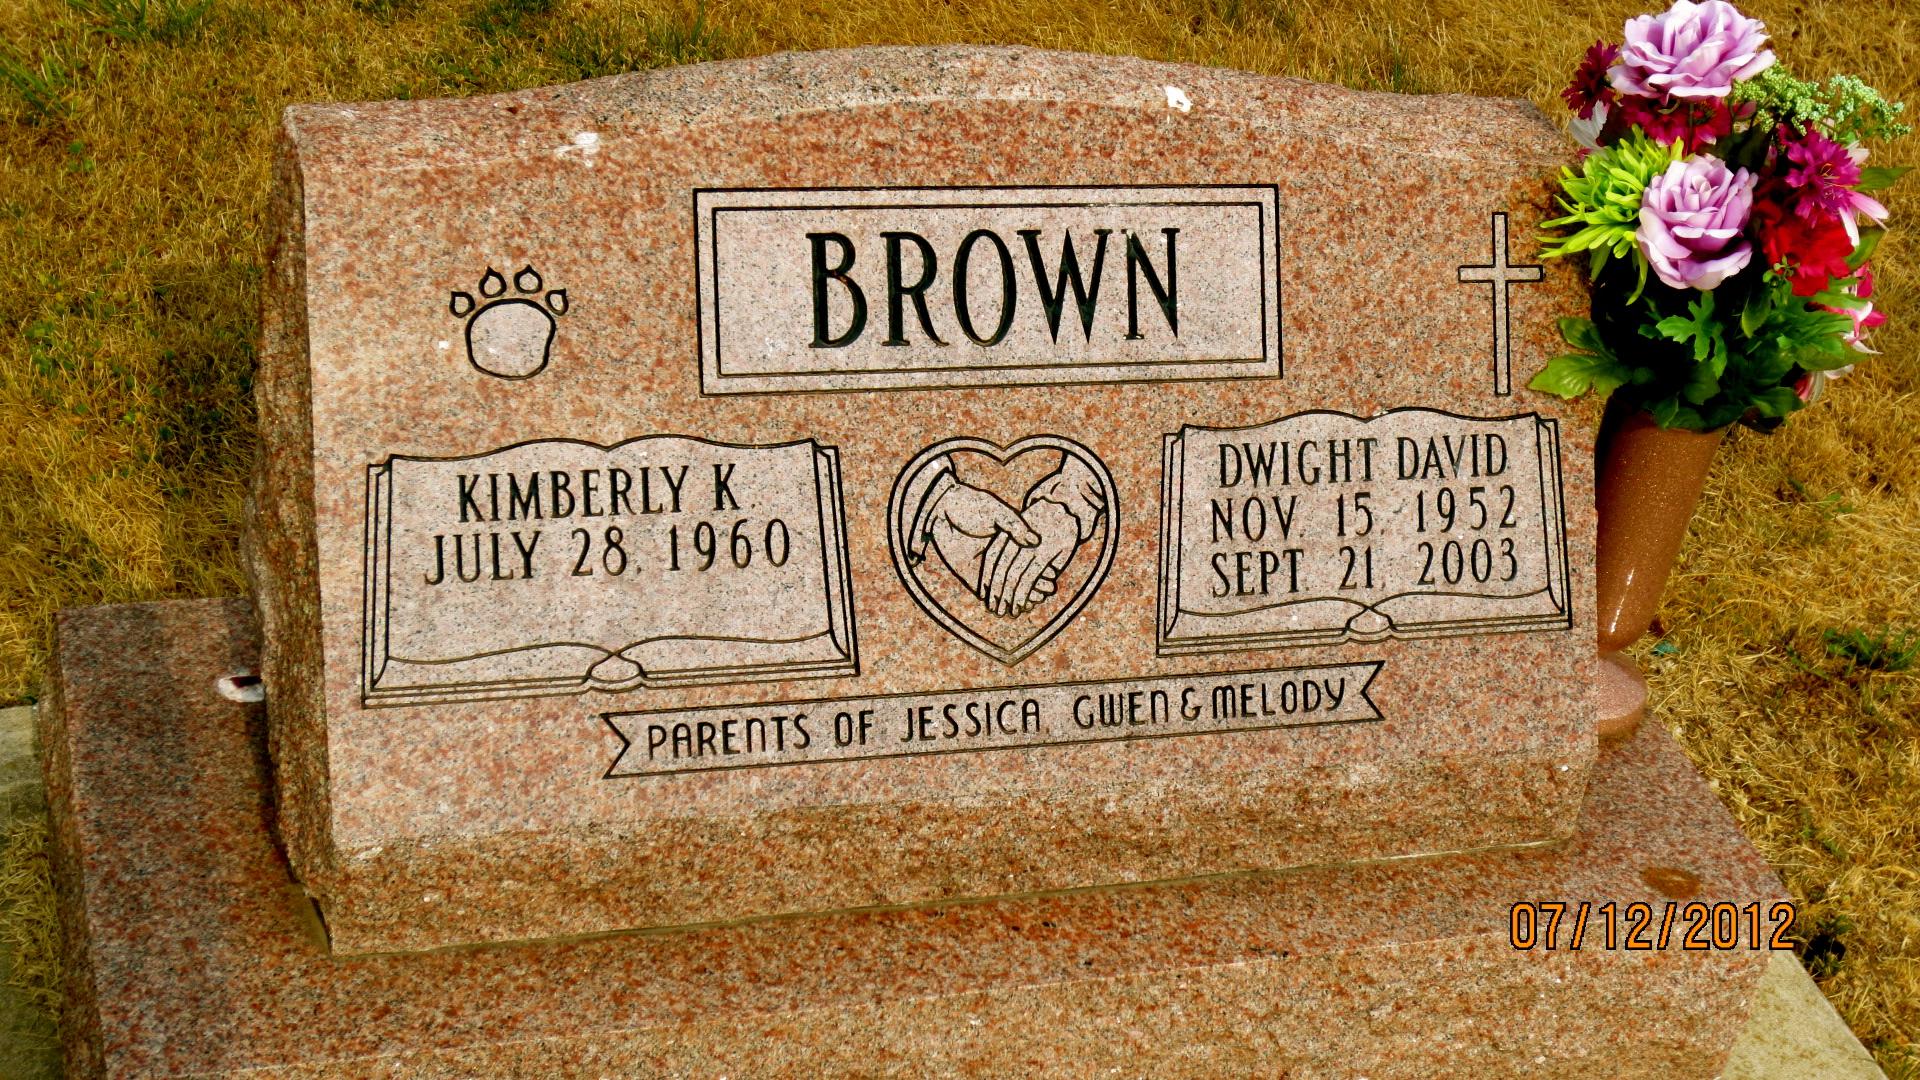 Dwight David Brown